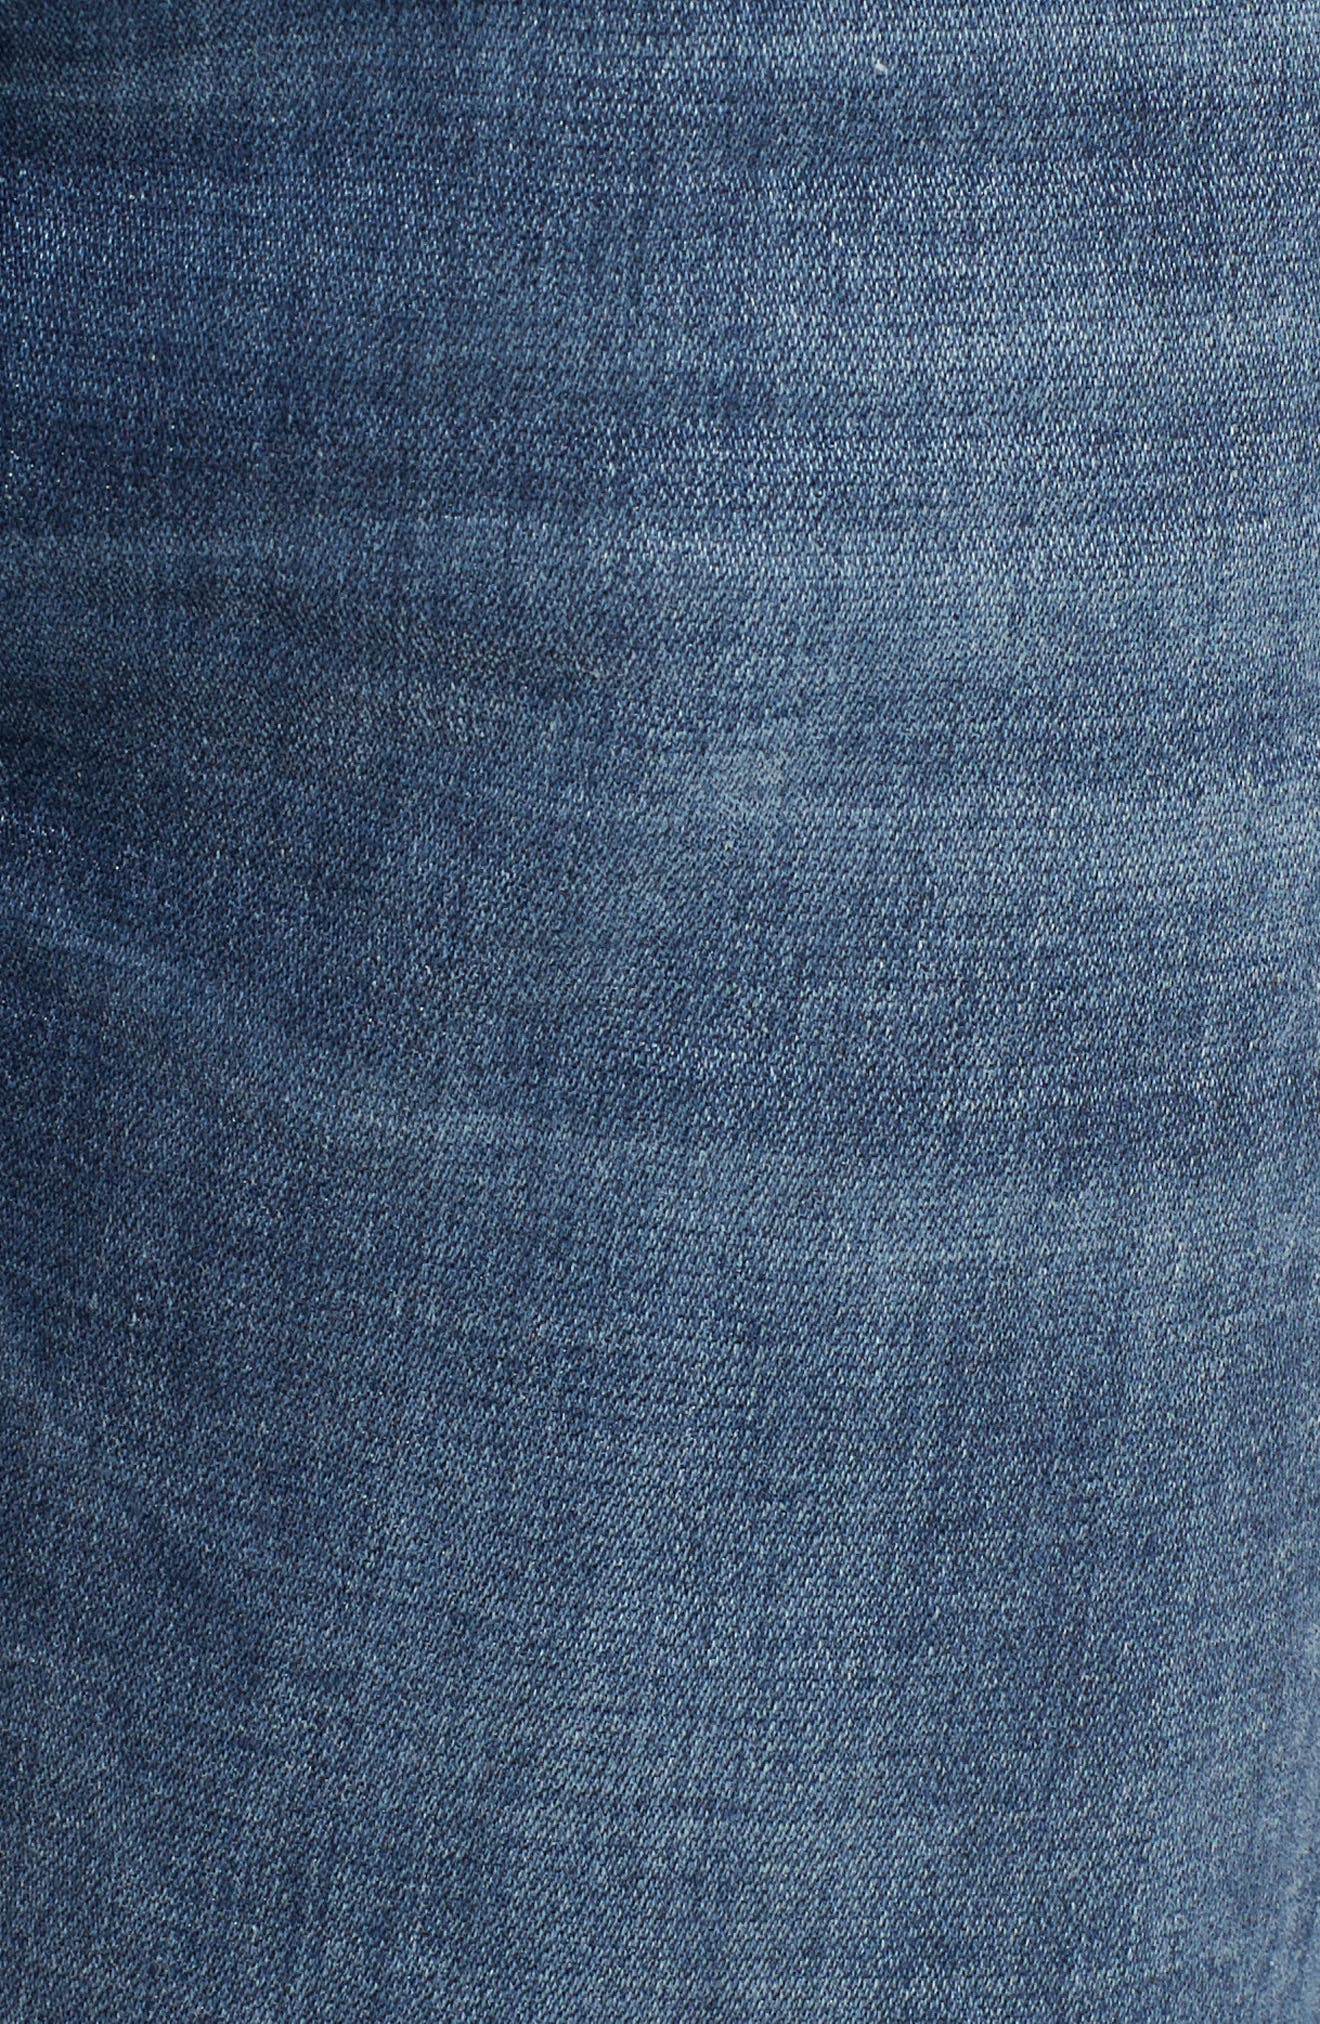 Geno Straight Leg Jeans,                             Alternate thumbnail 5, color,                             Suspect